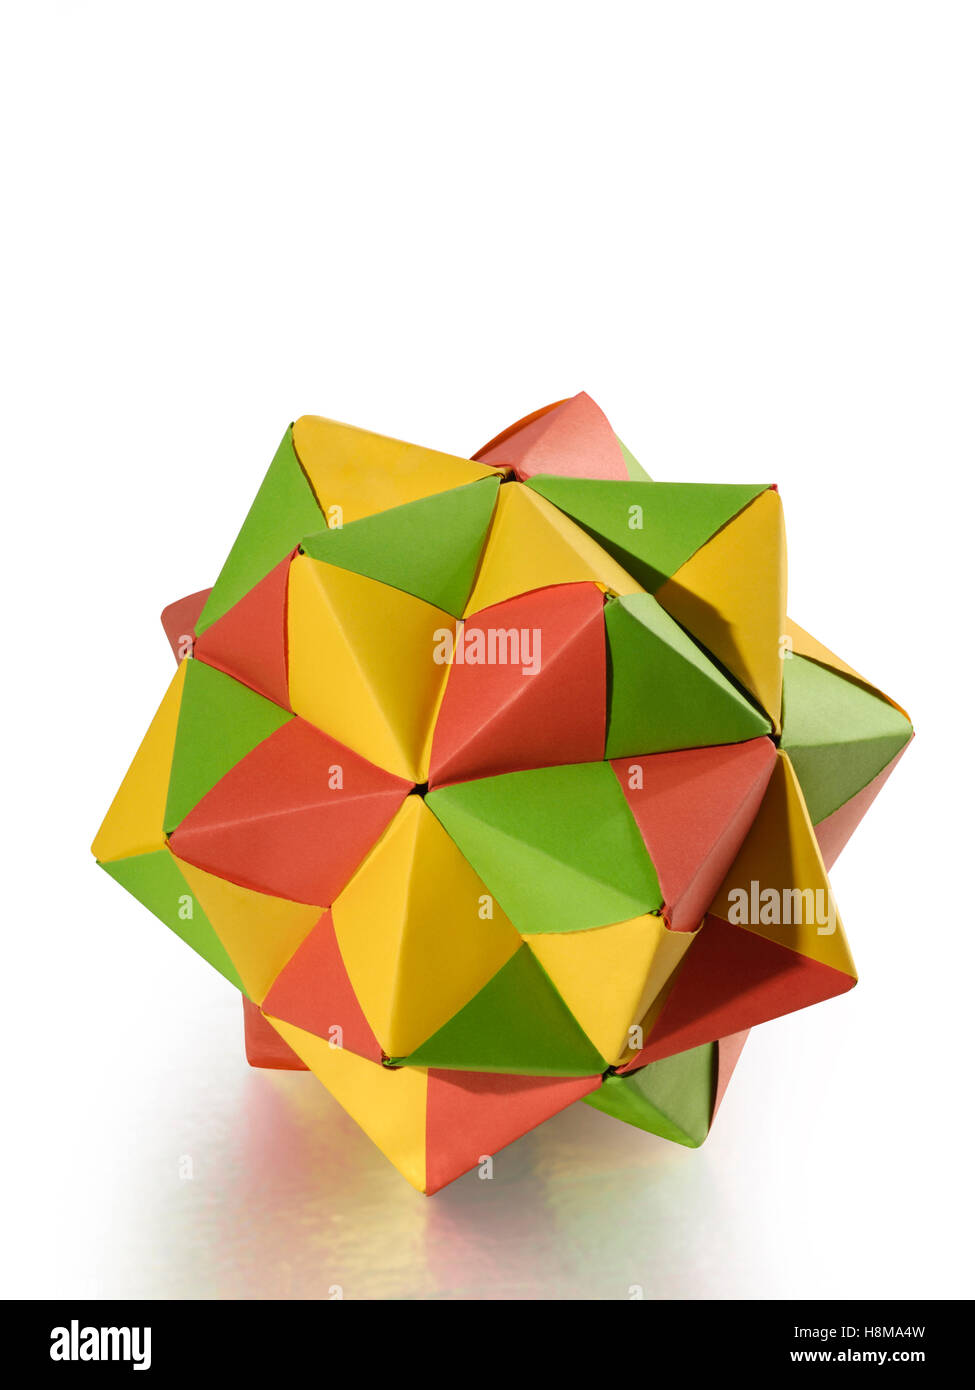 Colorful origami polyhedron figure - Stock Image